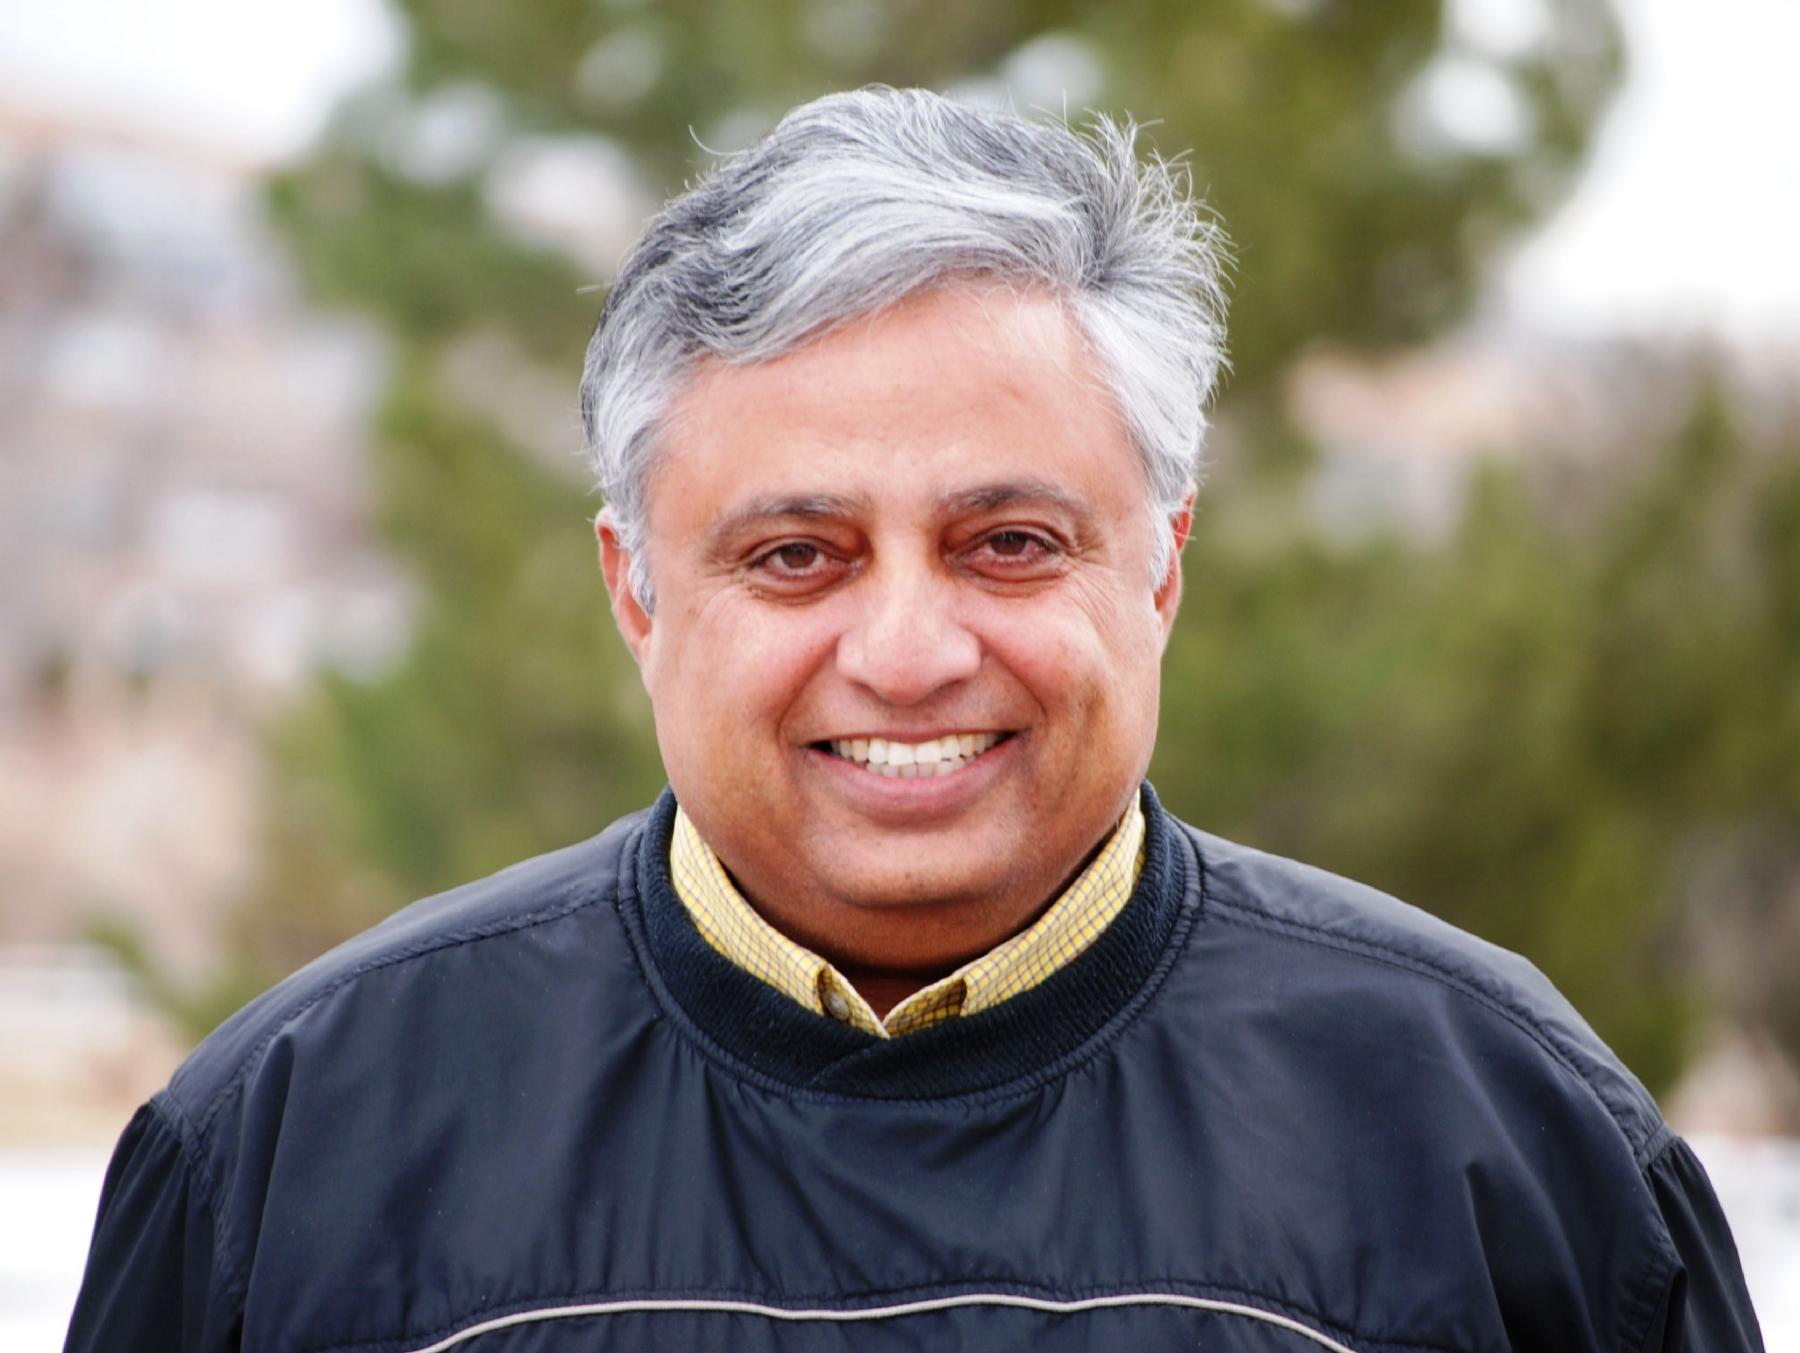 Hindu statesman Zed urges Pak National Assembly to consider Hindu festivals as holiday